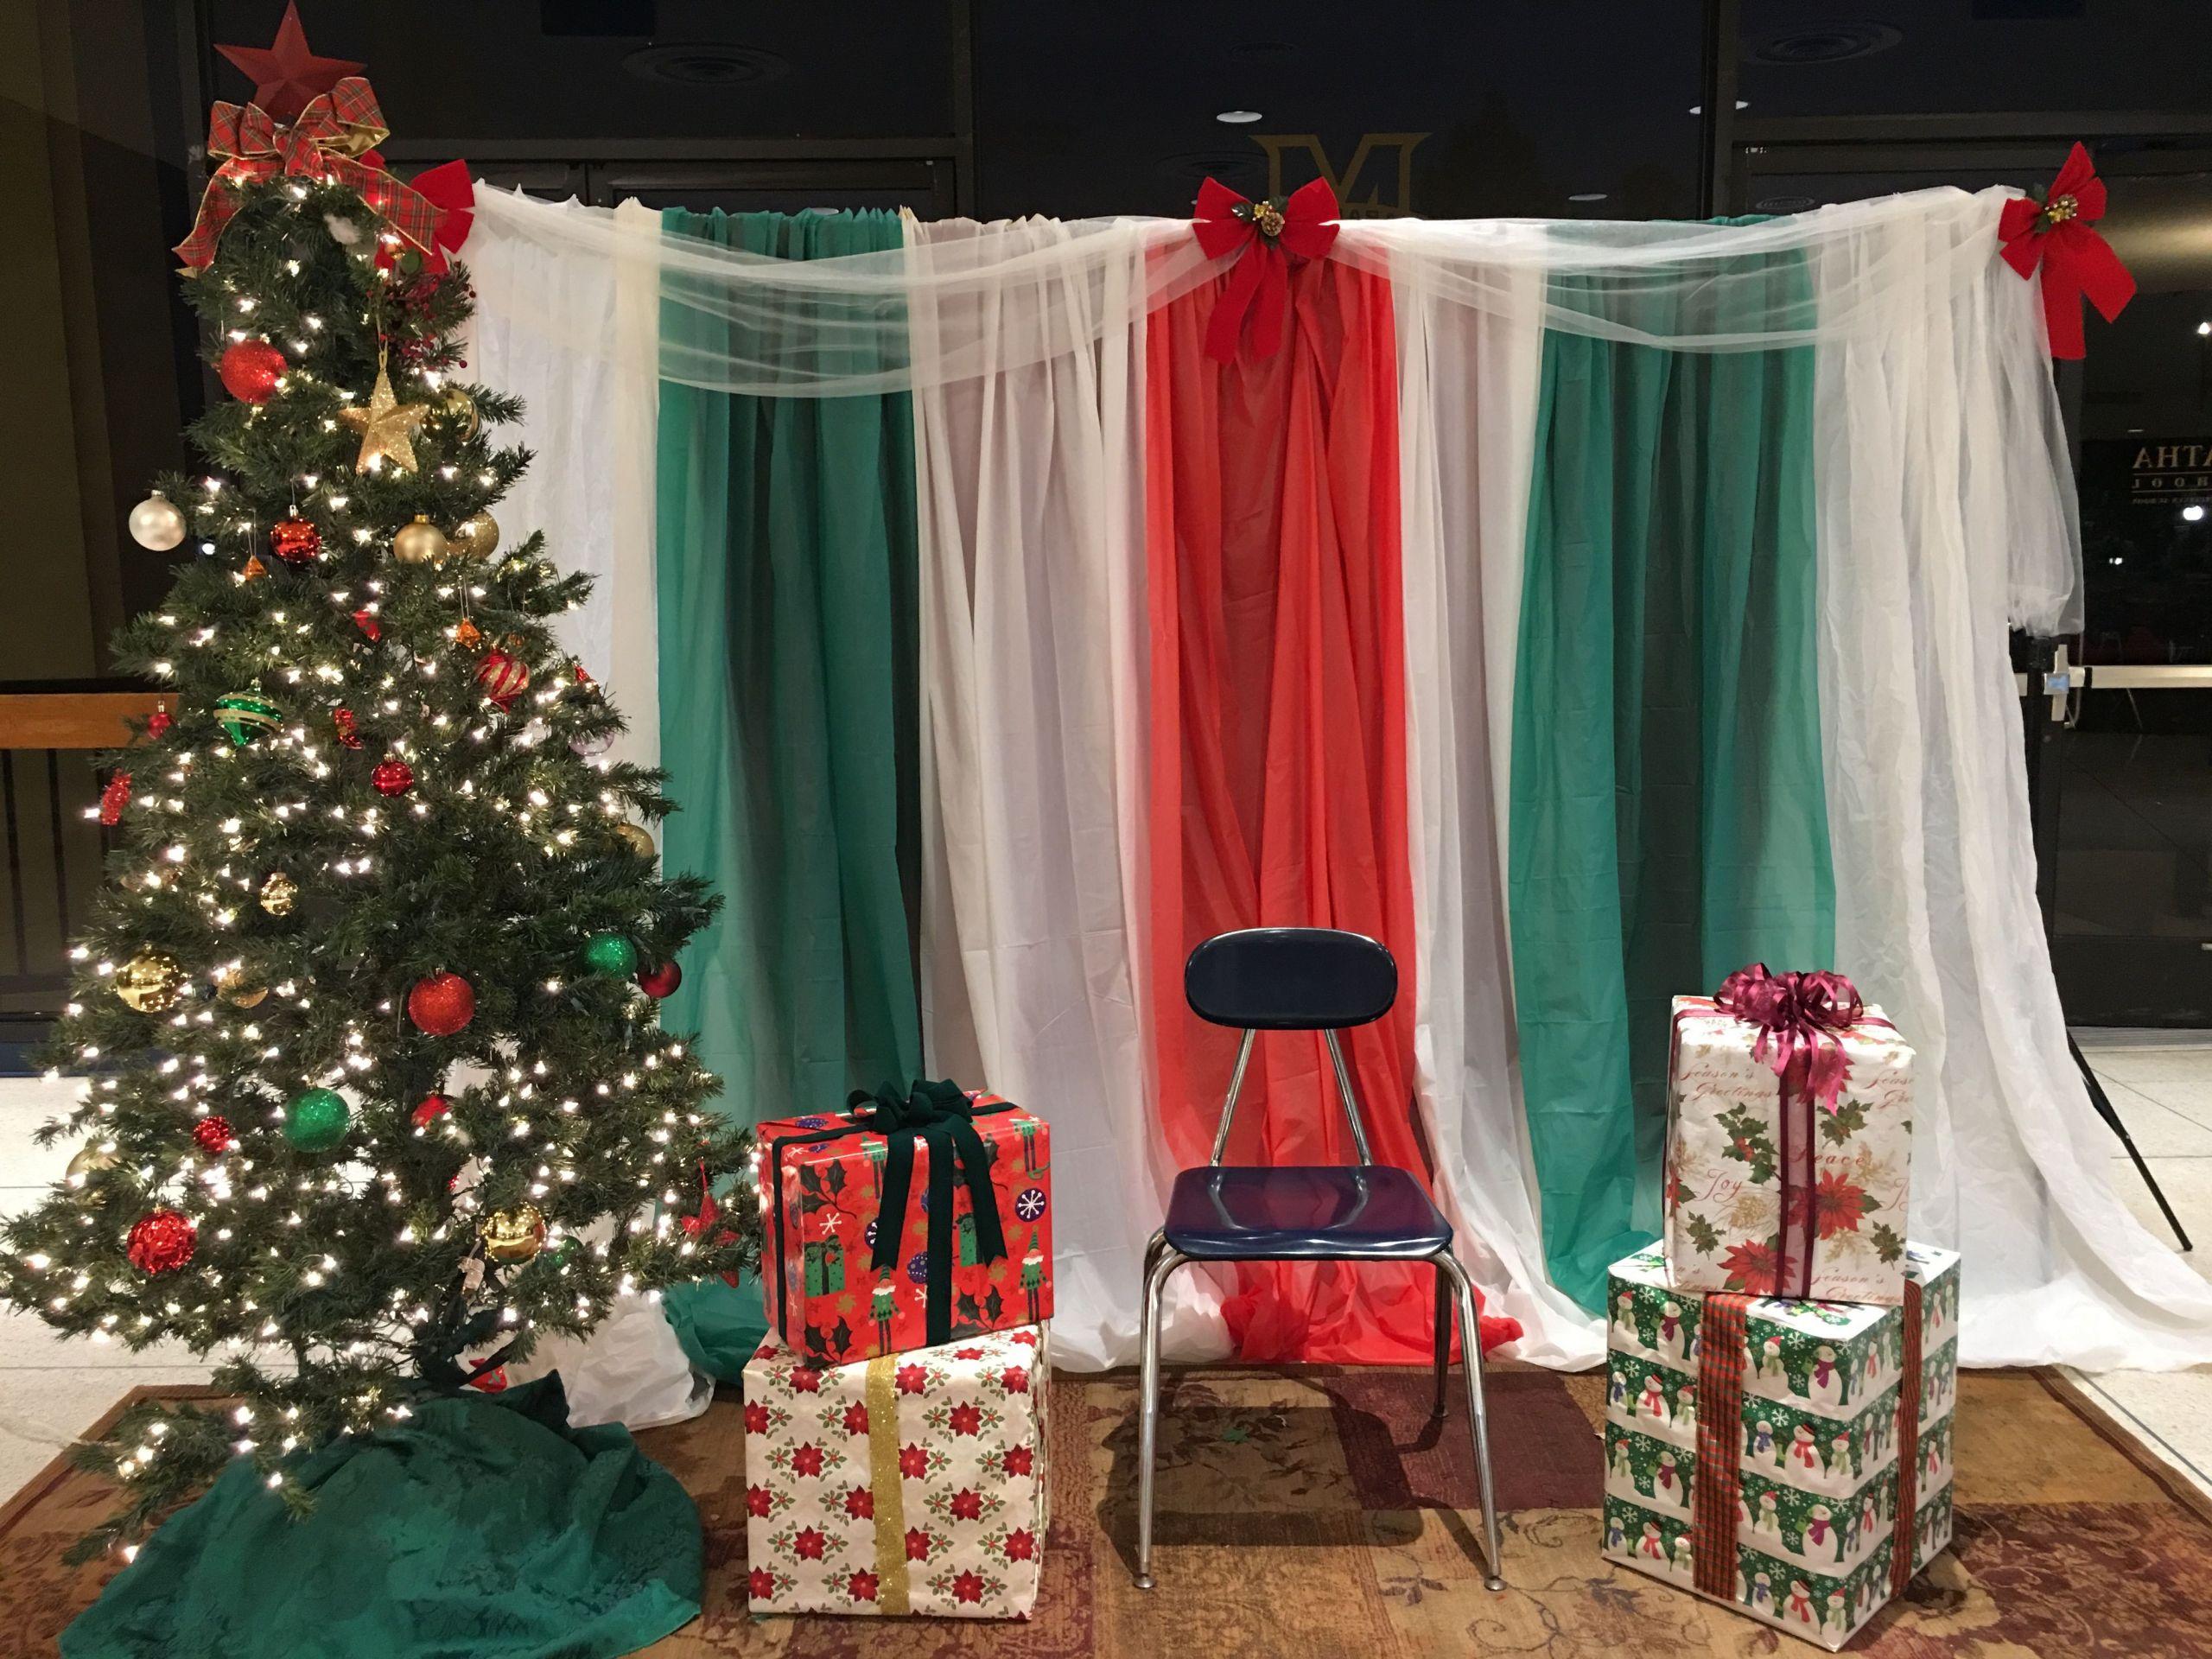 DIY Christmas Photography Backdrop  DIY easy Christmas Santa photobooth backdrop plastic